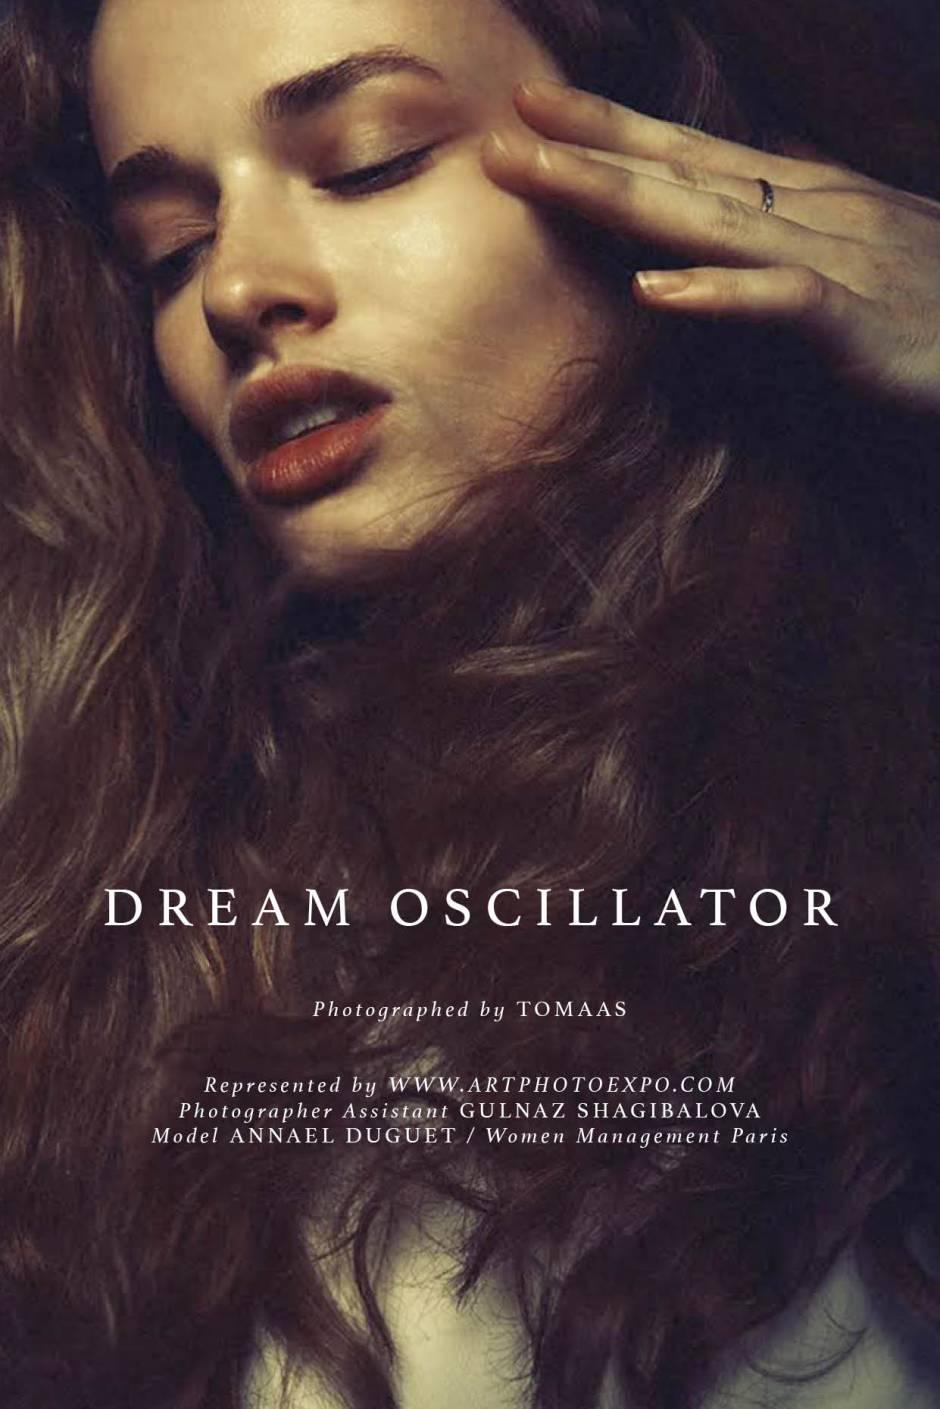 Dream Oscillator